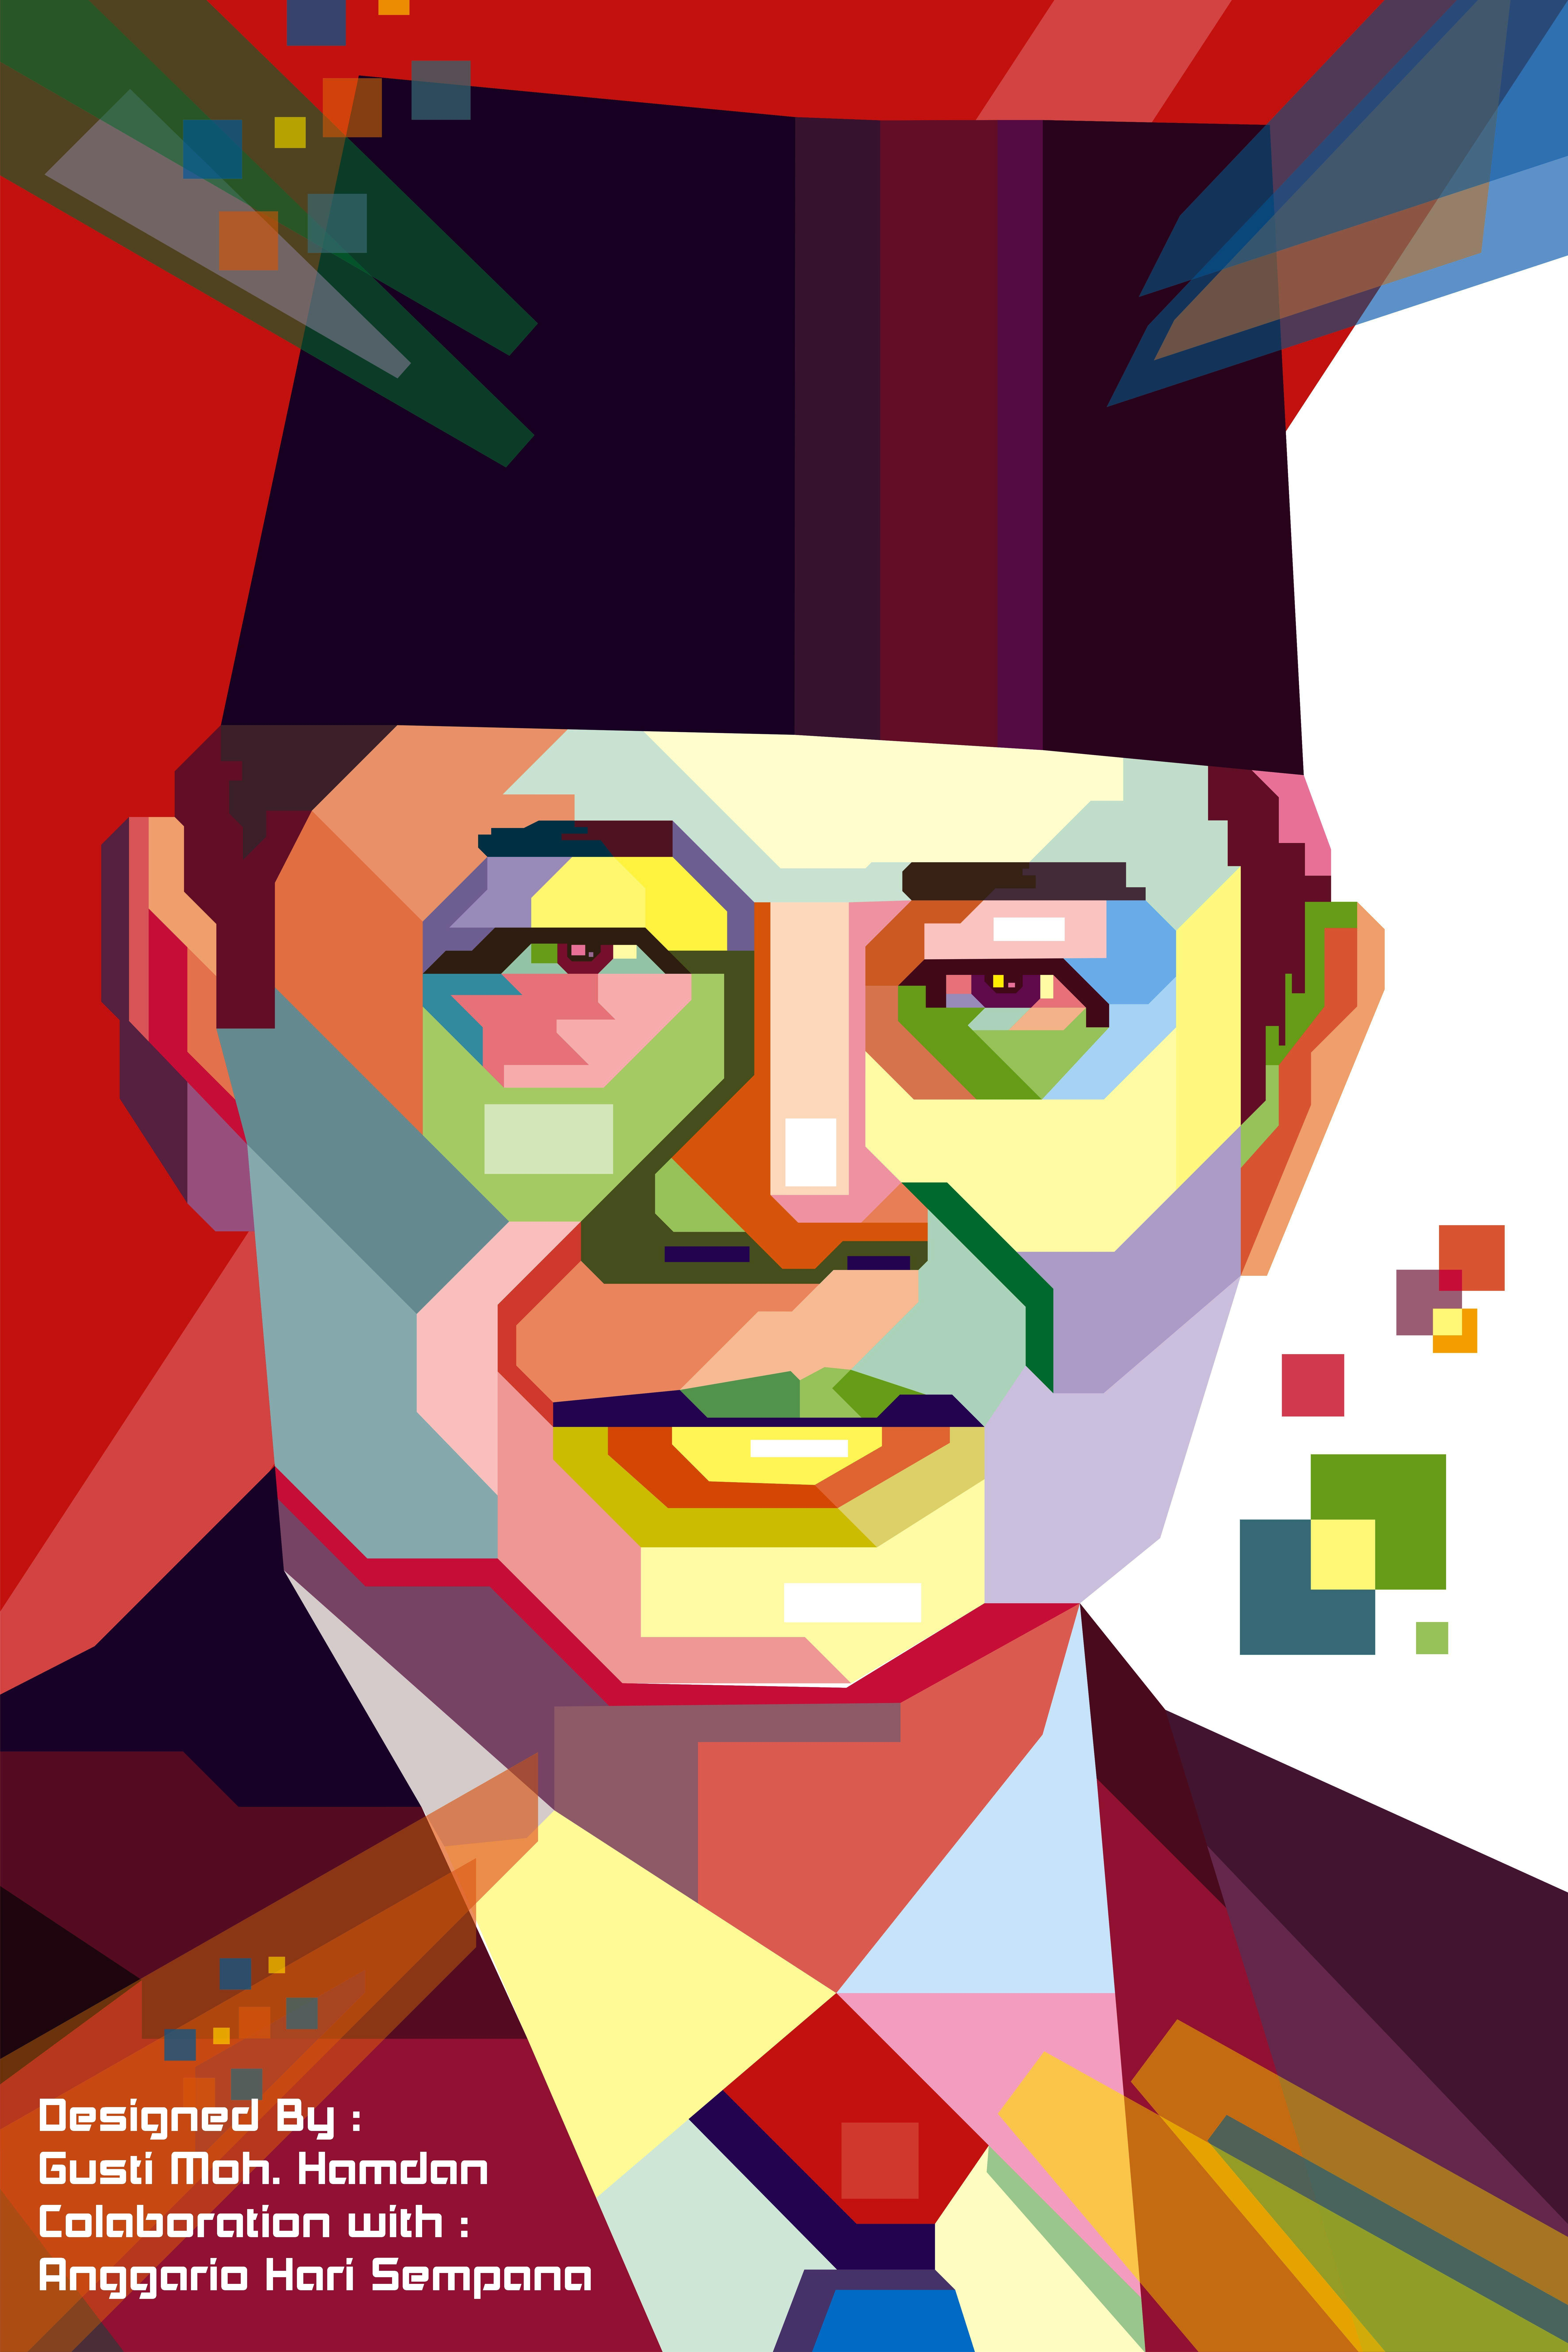 Wpap Susilo Bambang Yudhoyono SBY Work That Inspires Me Pinterest